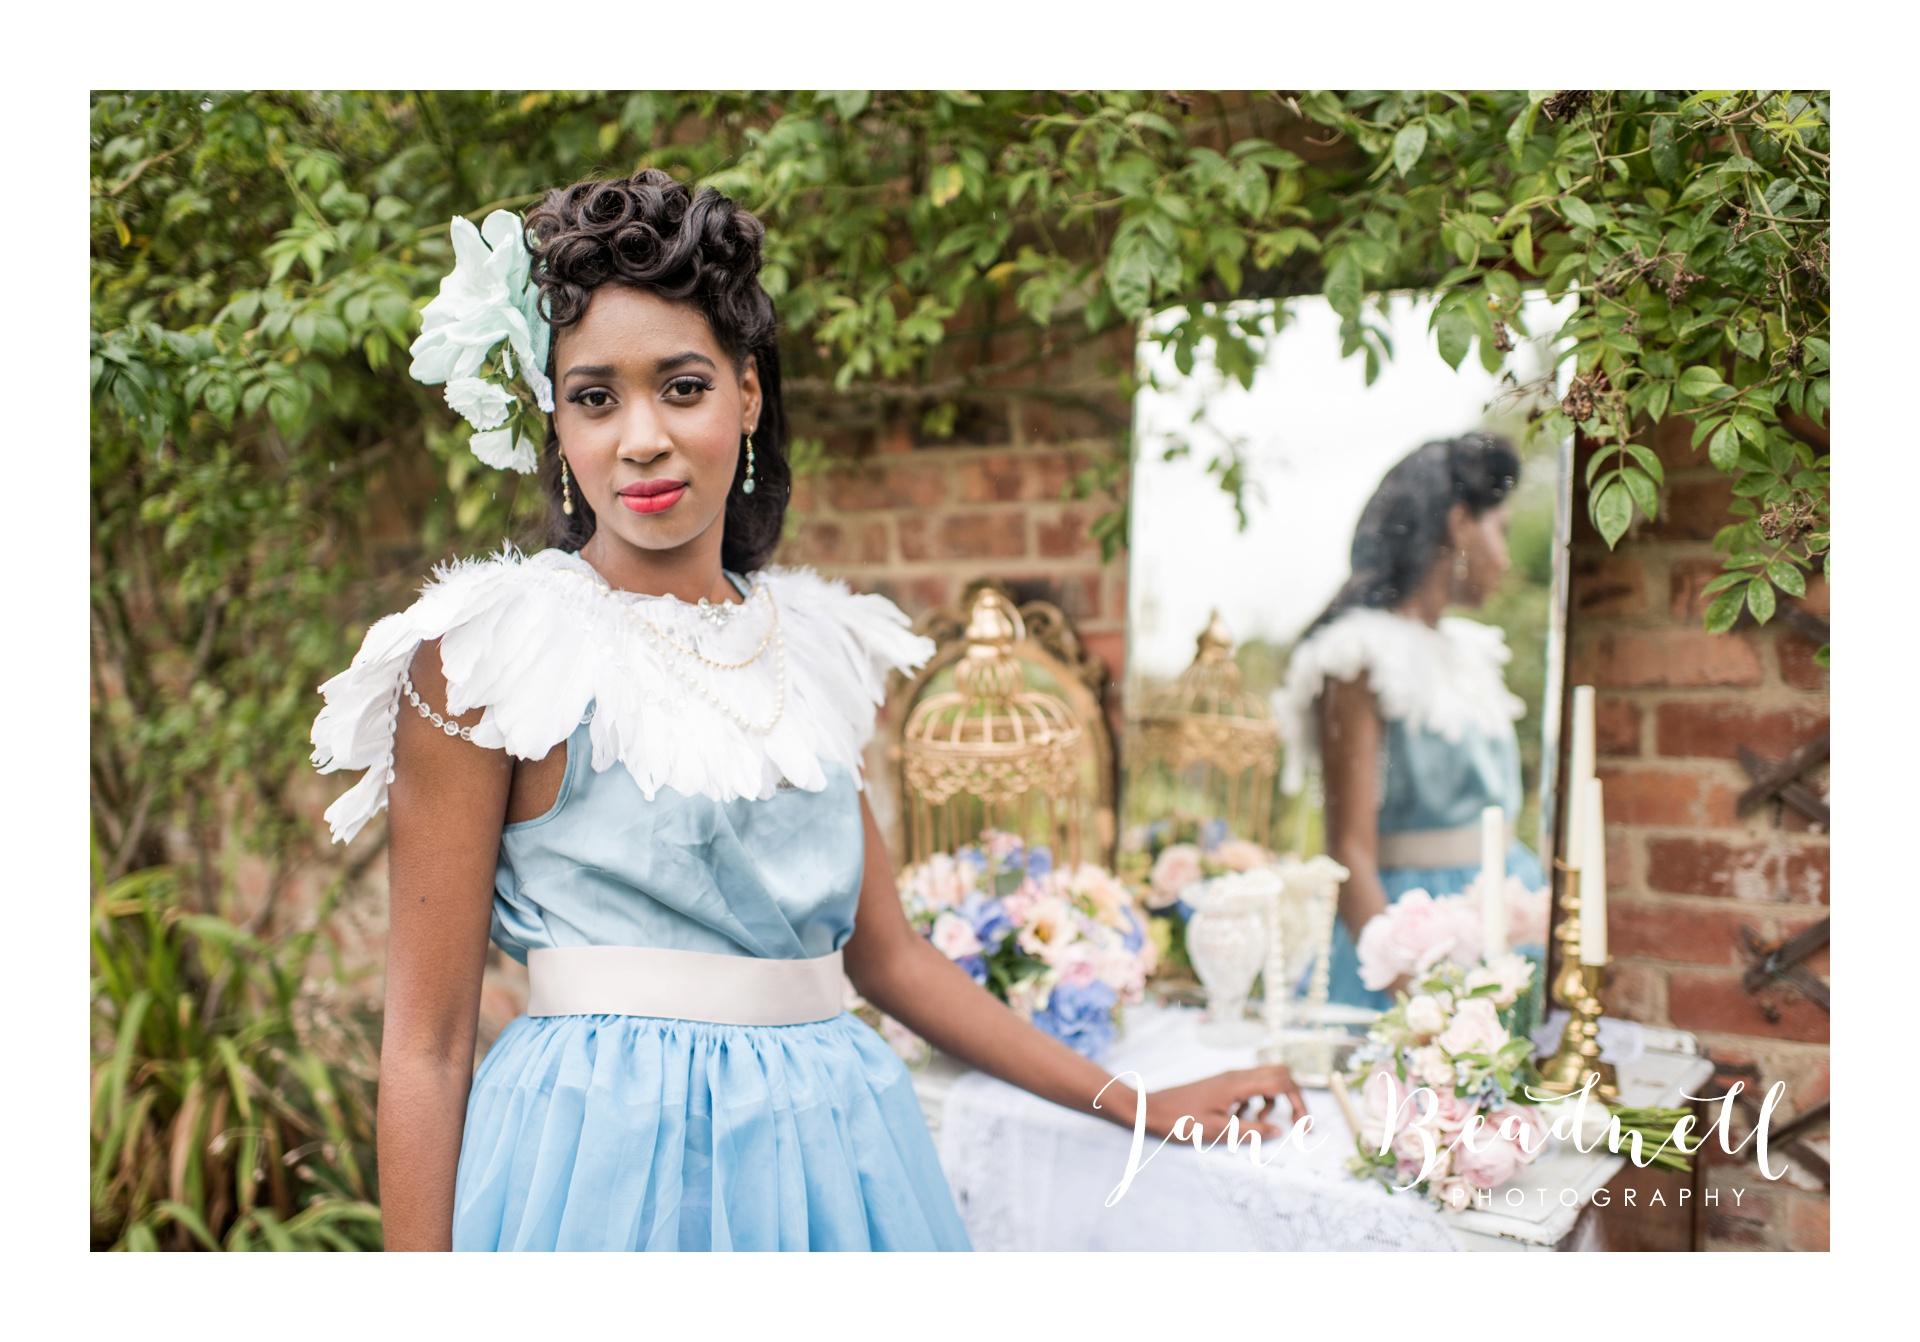 fine-art-wedding-photographer-jane-beadnell-photography_0047